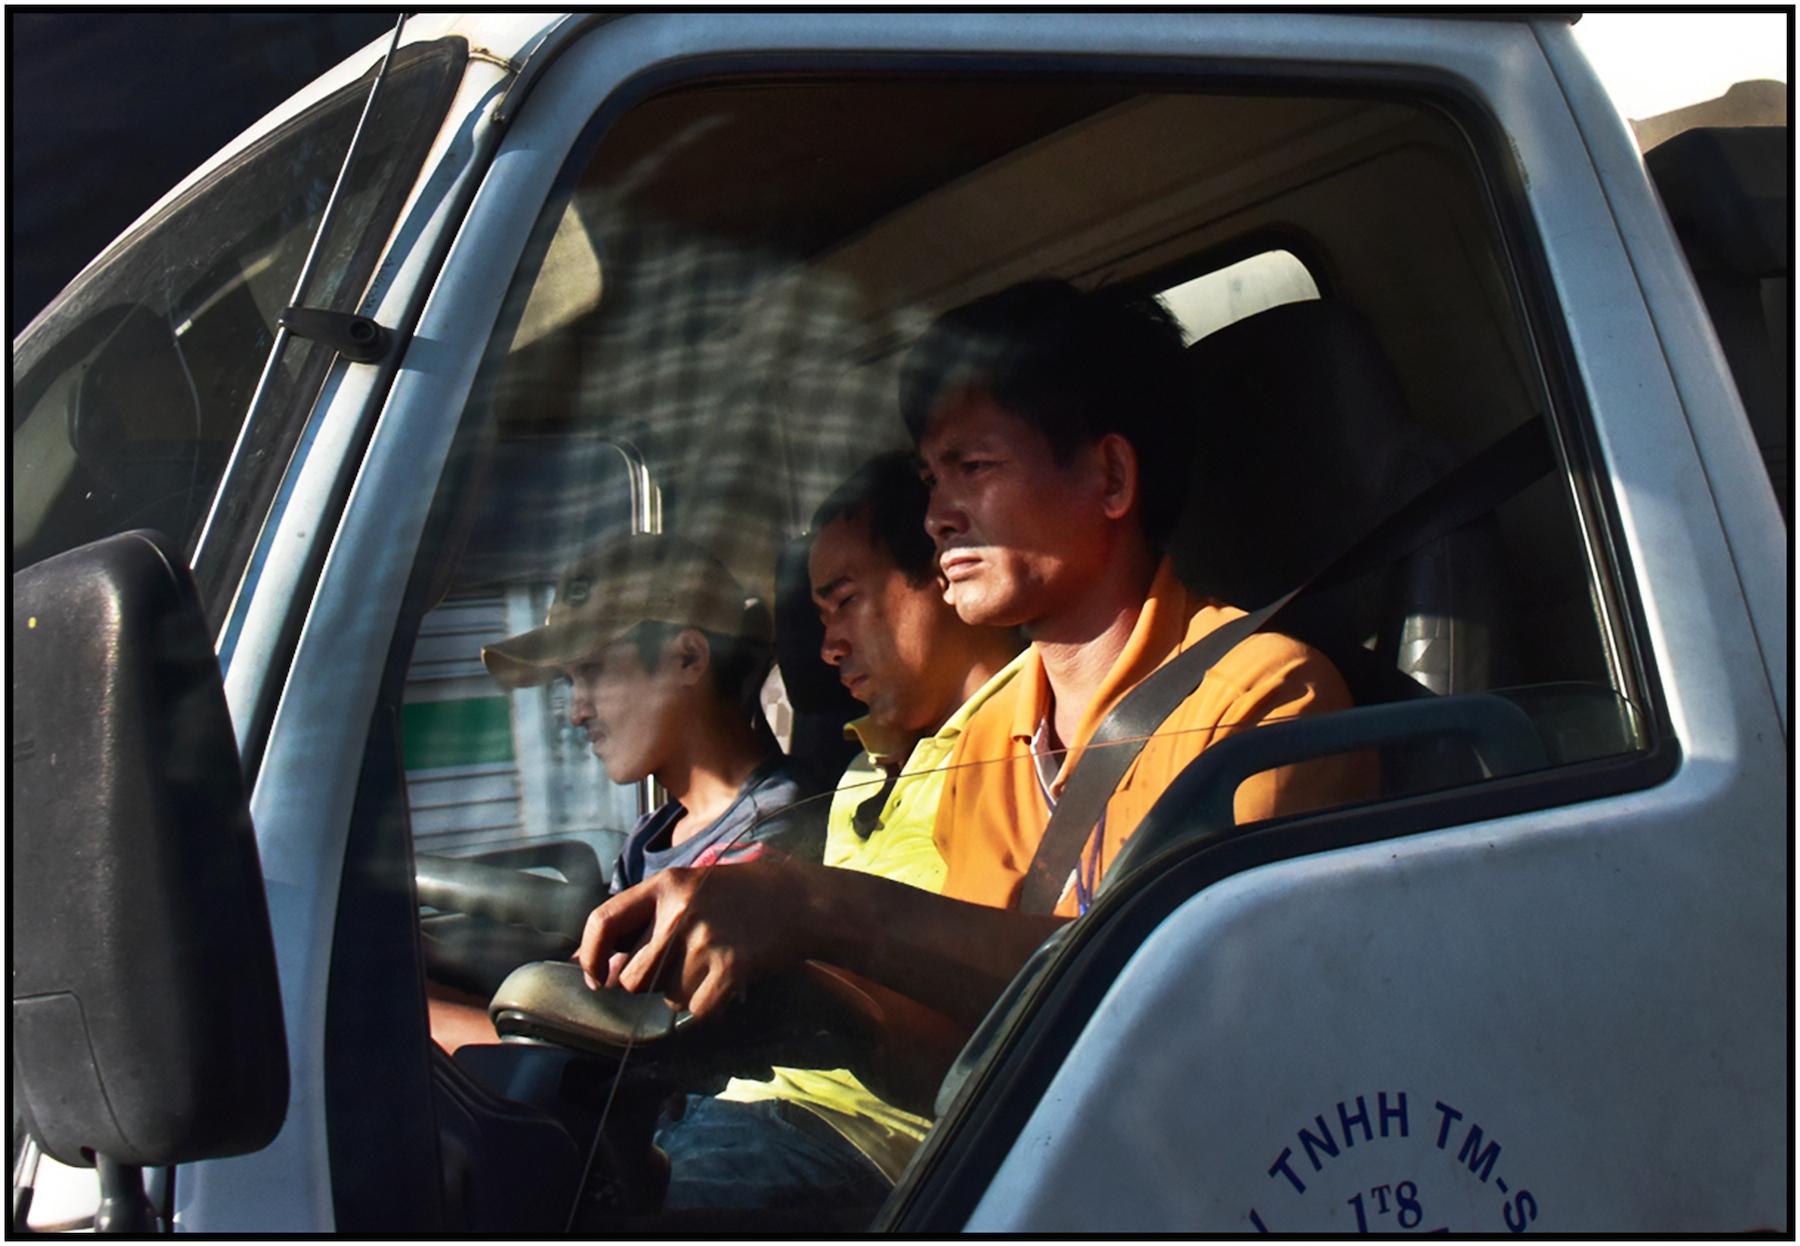 Truck drivers, near Can Tho, Mekong Delta, Jan. 2016. #8823